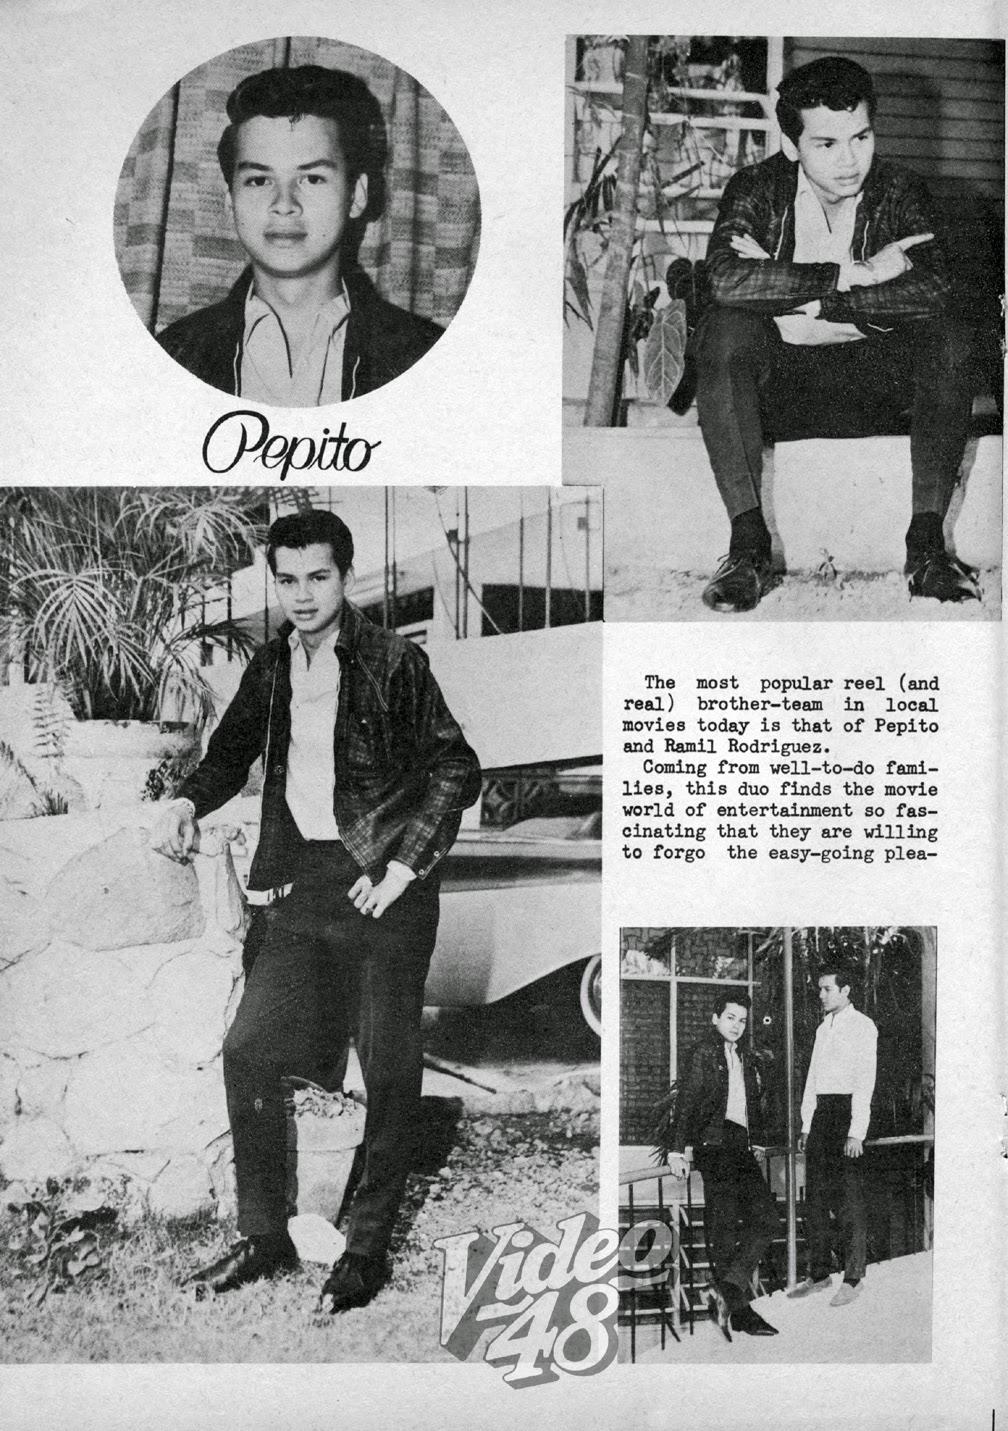 Ramil Rodriguez Video 48 1965 MEET PEPITO RODRIGUEZ AND RAMIL RODRIGUEZ POPULAR